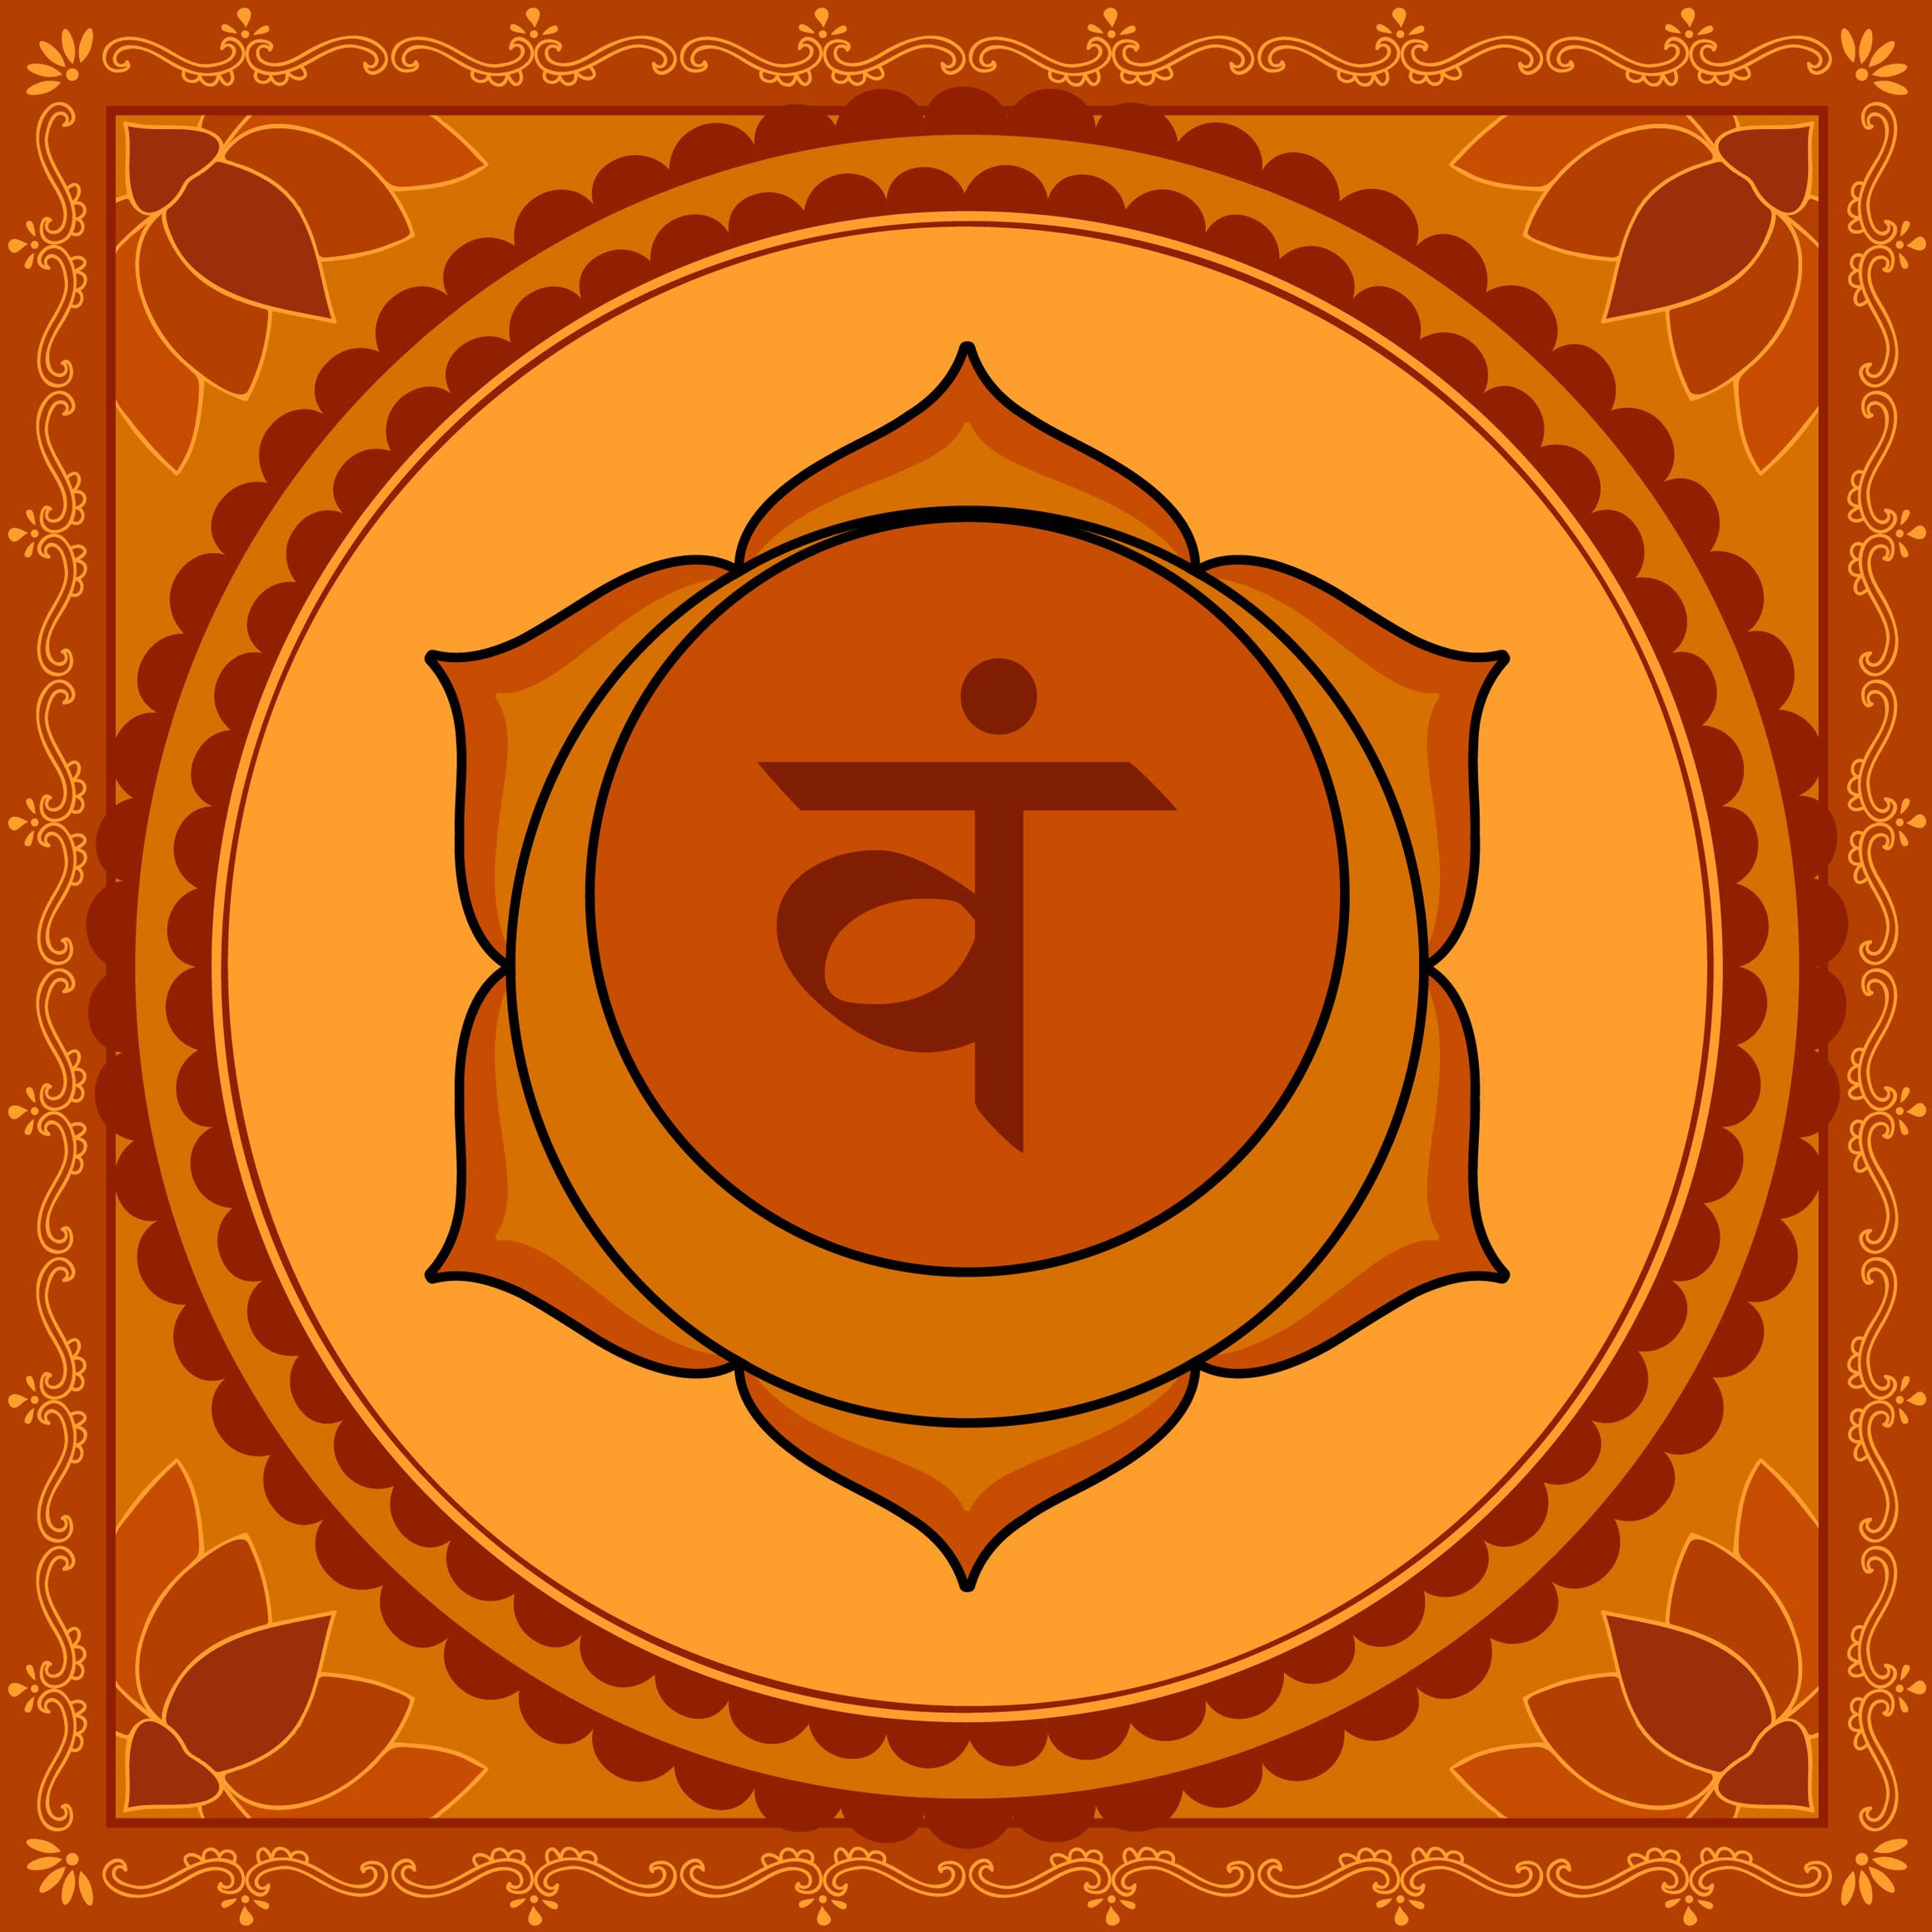 [Image: Svadhisthana-chakra.jpg]